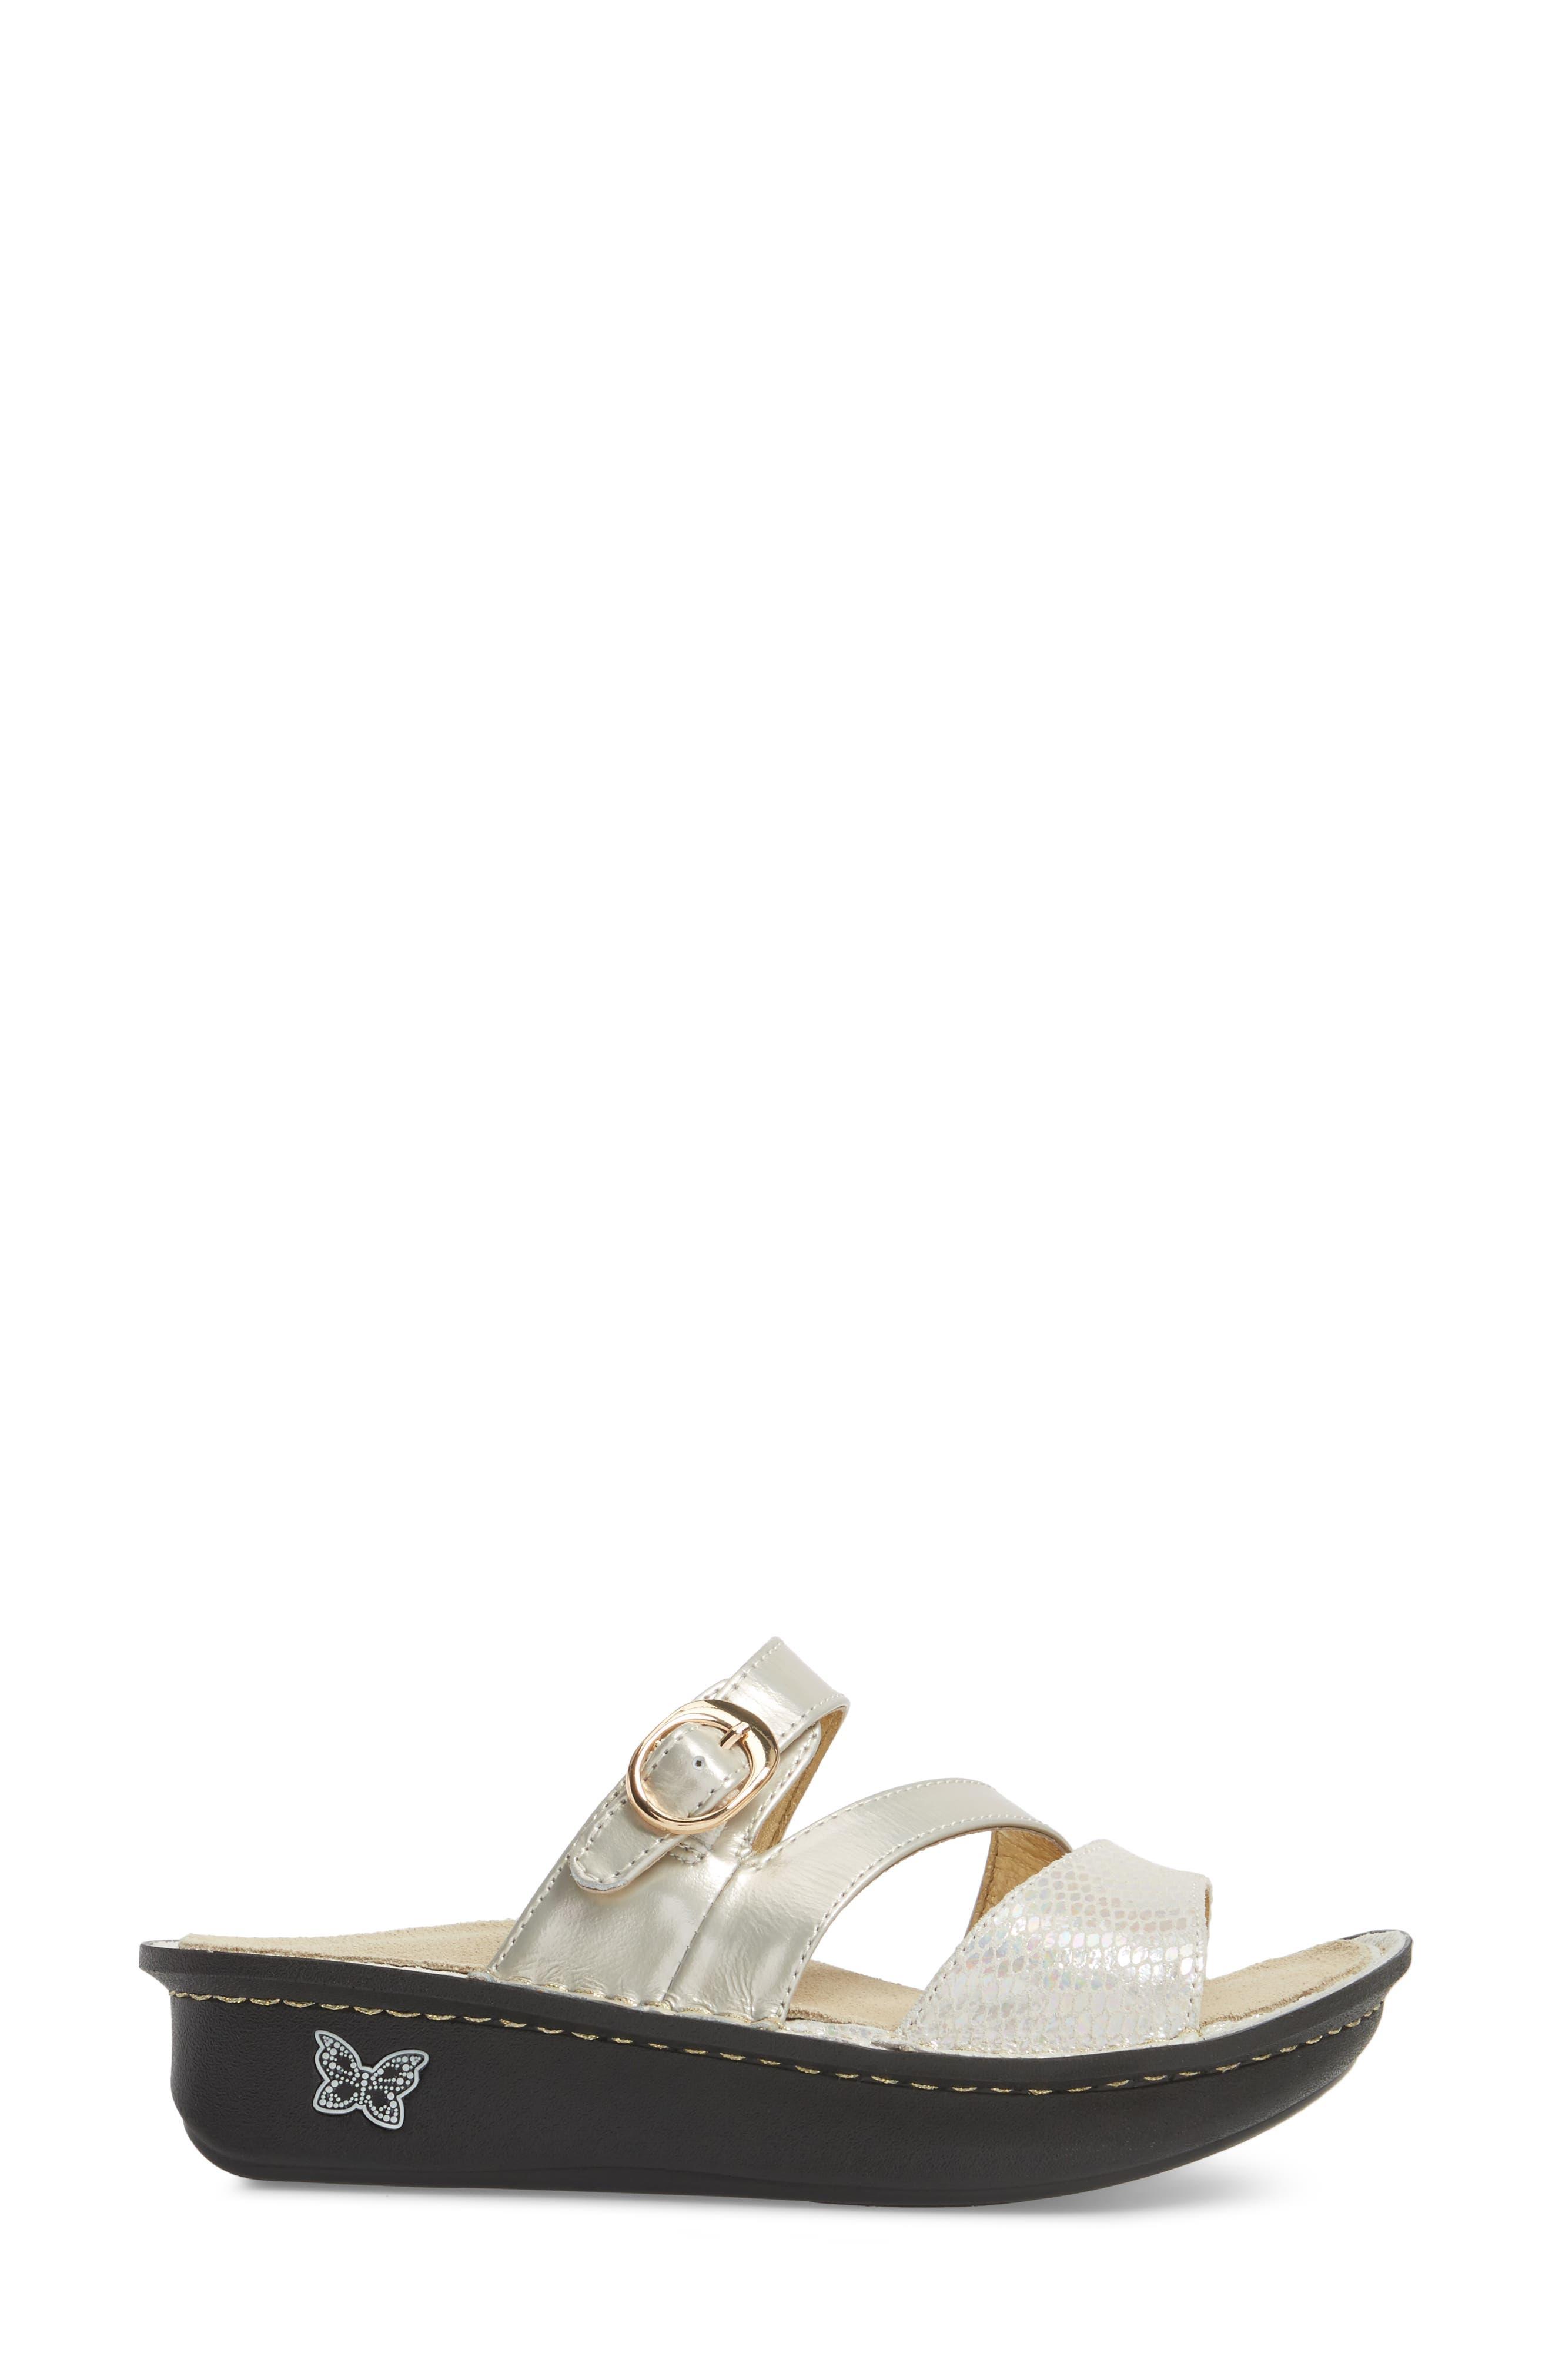 'Colette' Platform Sandal,                             Alternate thumbnail 3, color,                             Opfully Leather